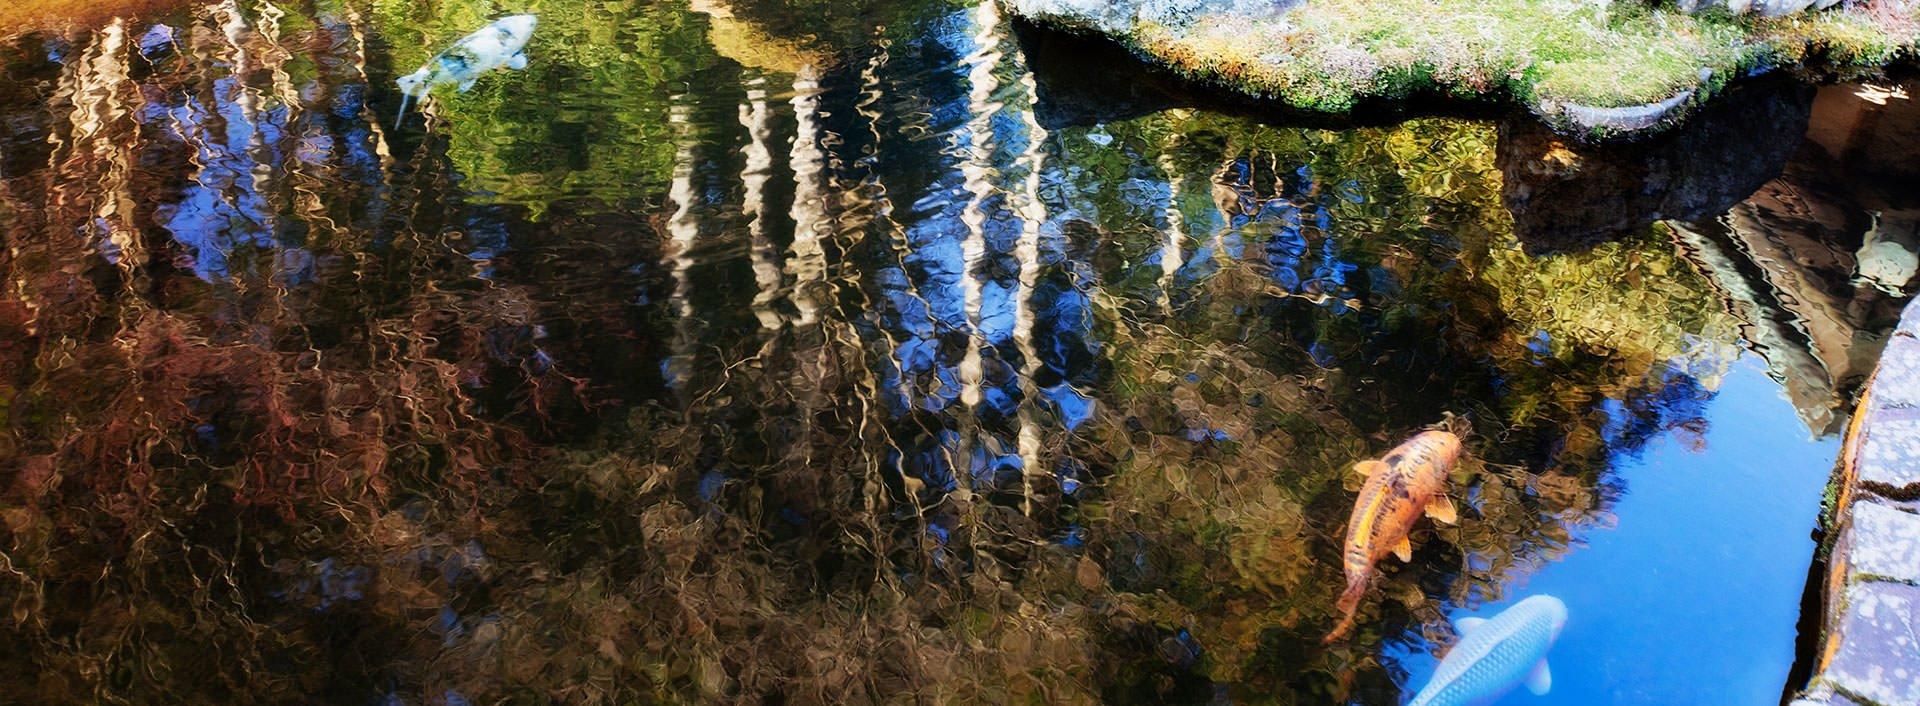 landscape photography 19